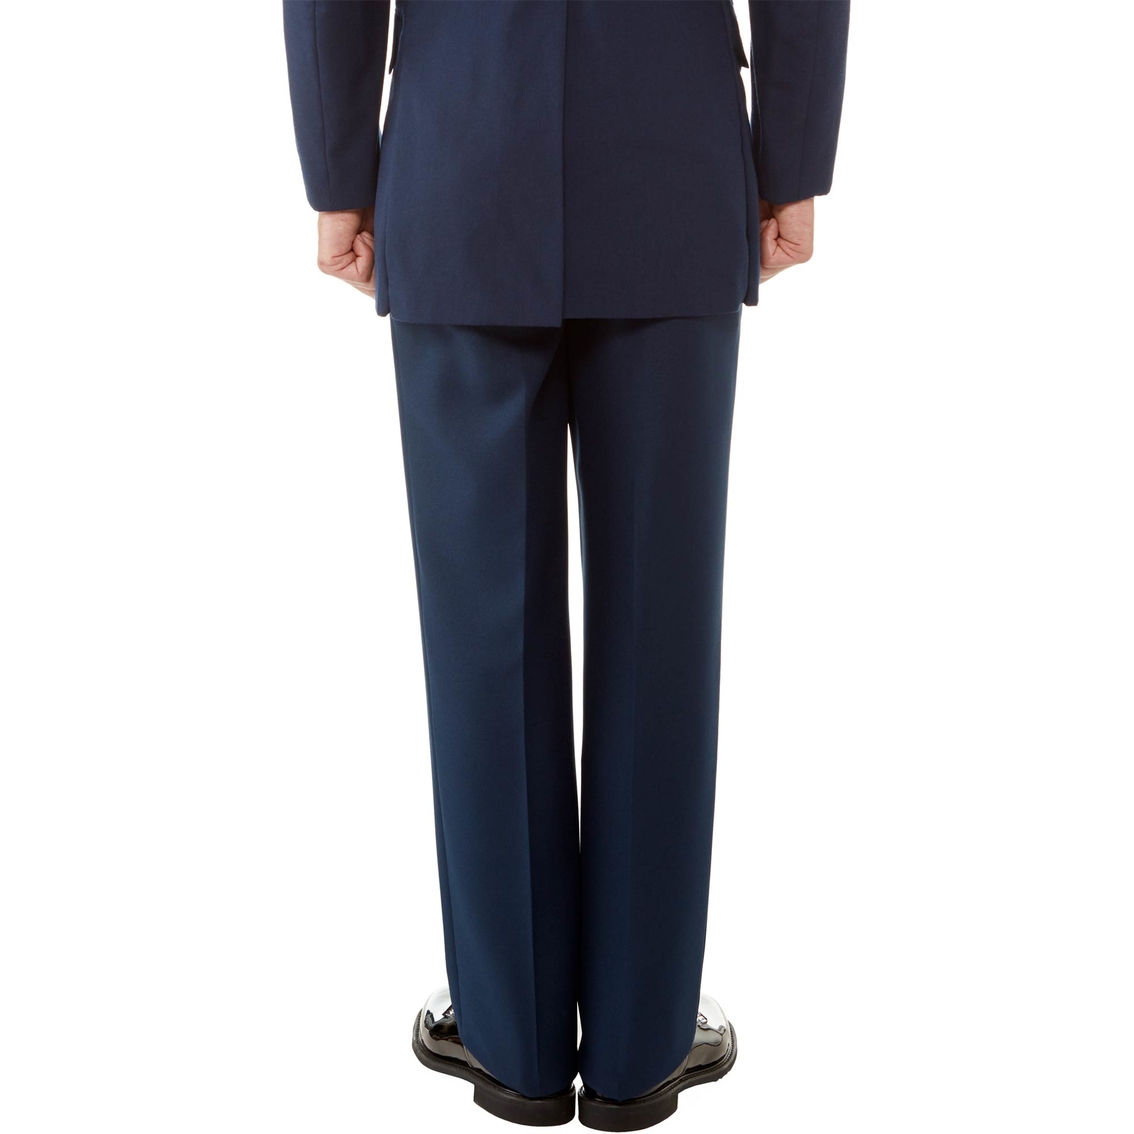 "Poly Wool Black Dress Trousers Waist 38/"" Inside Leg 34/"""